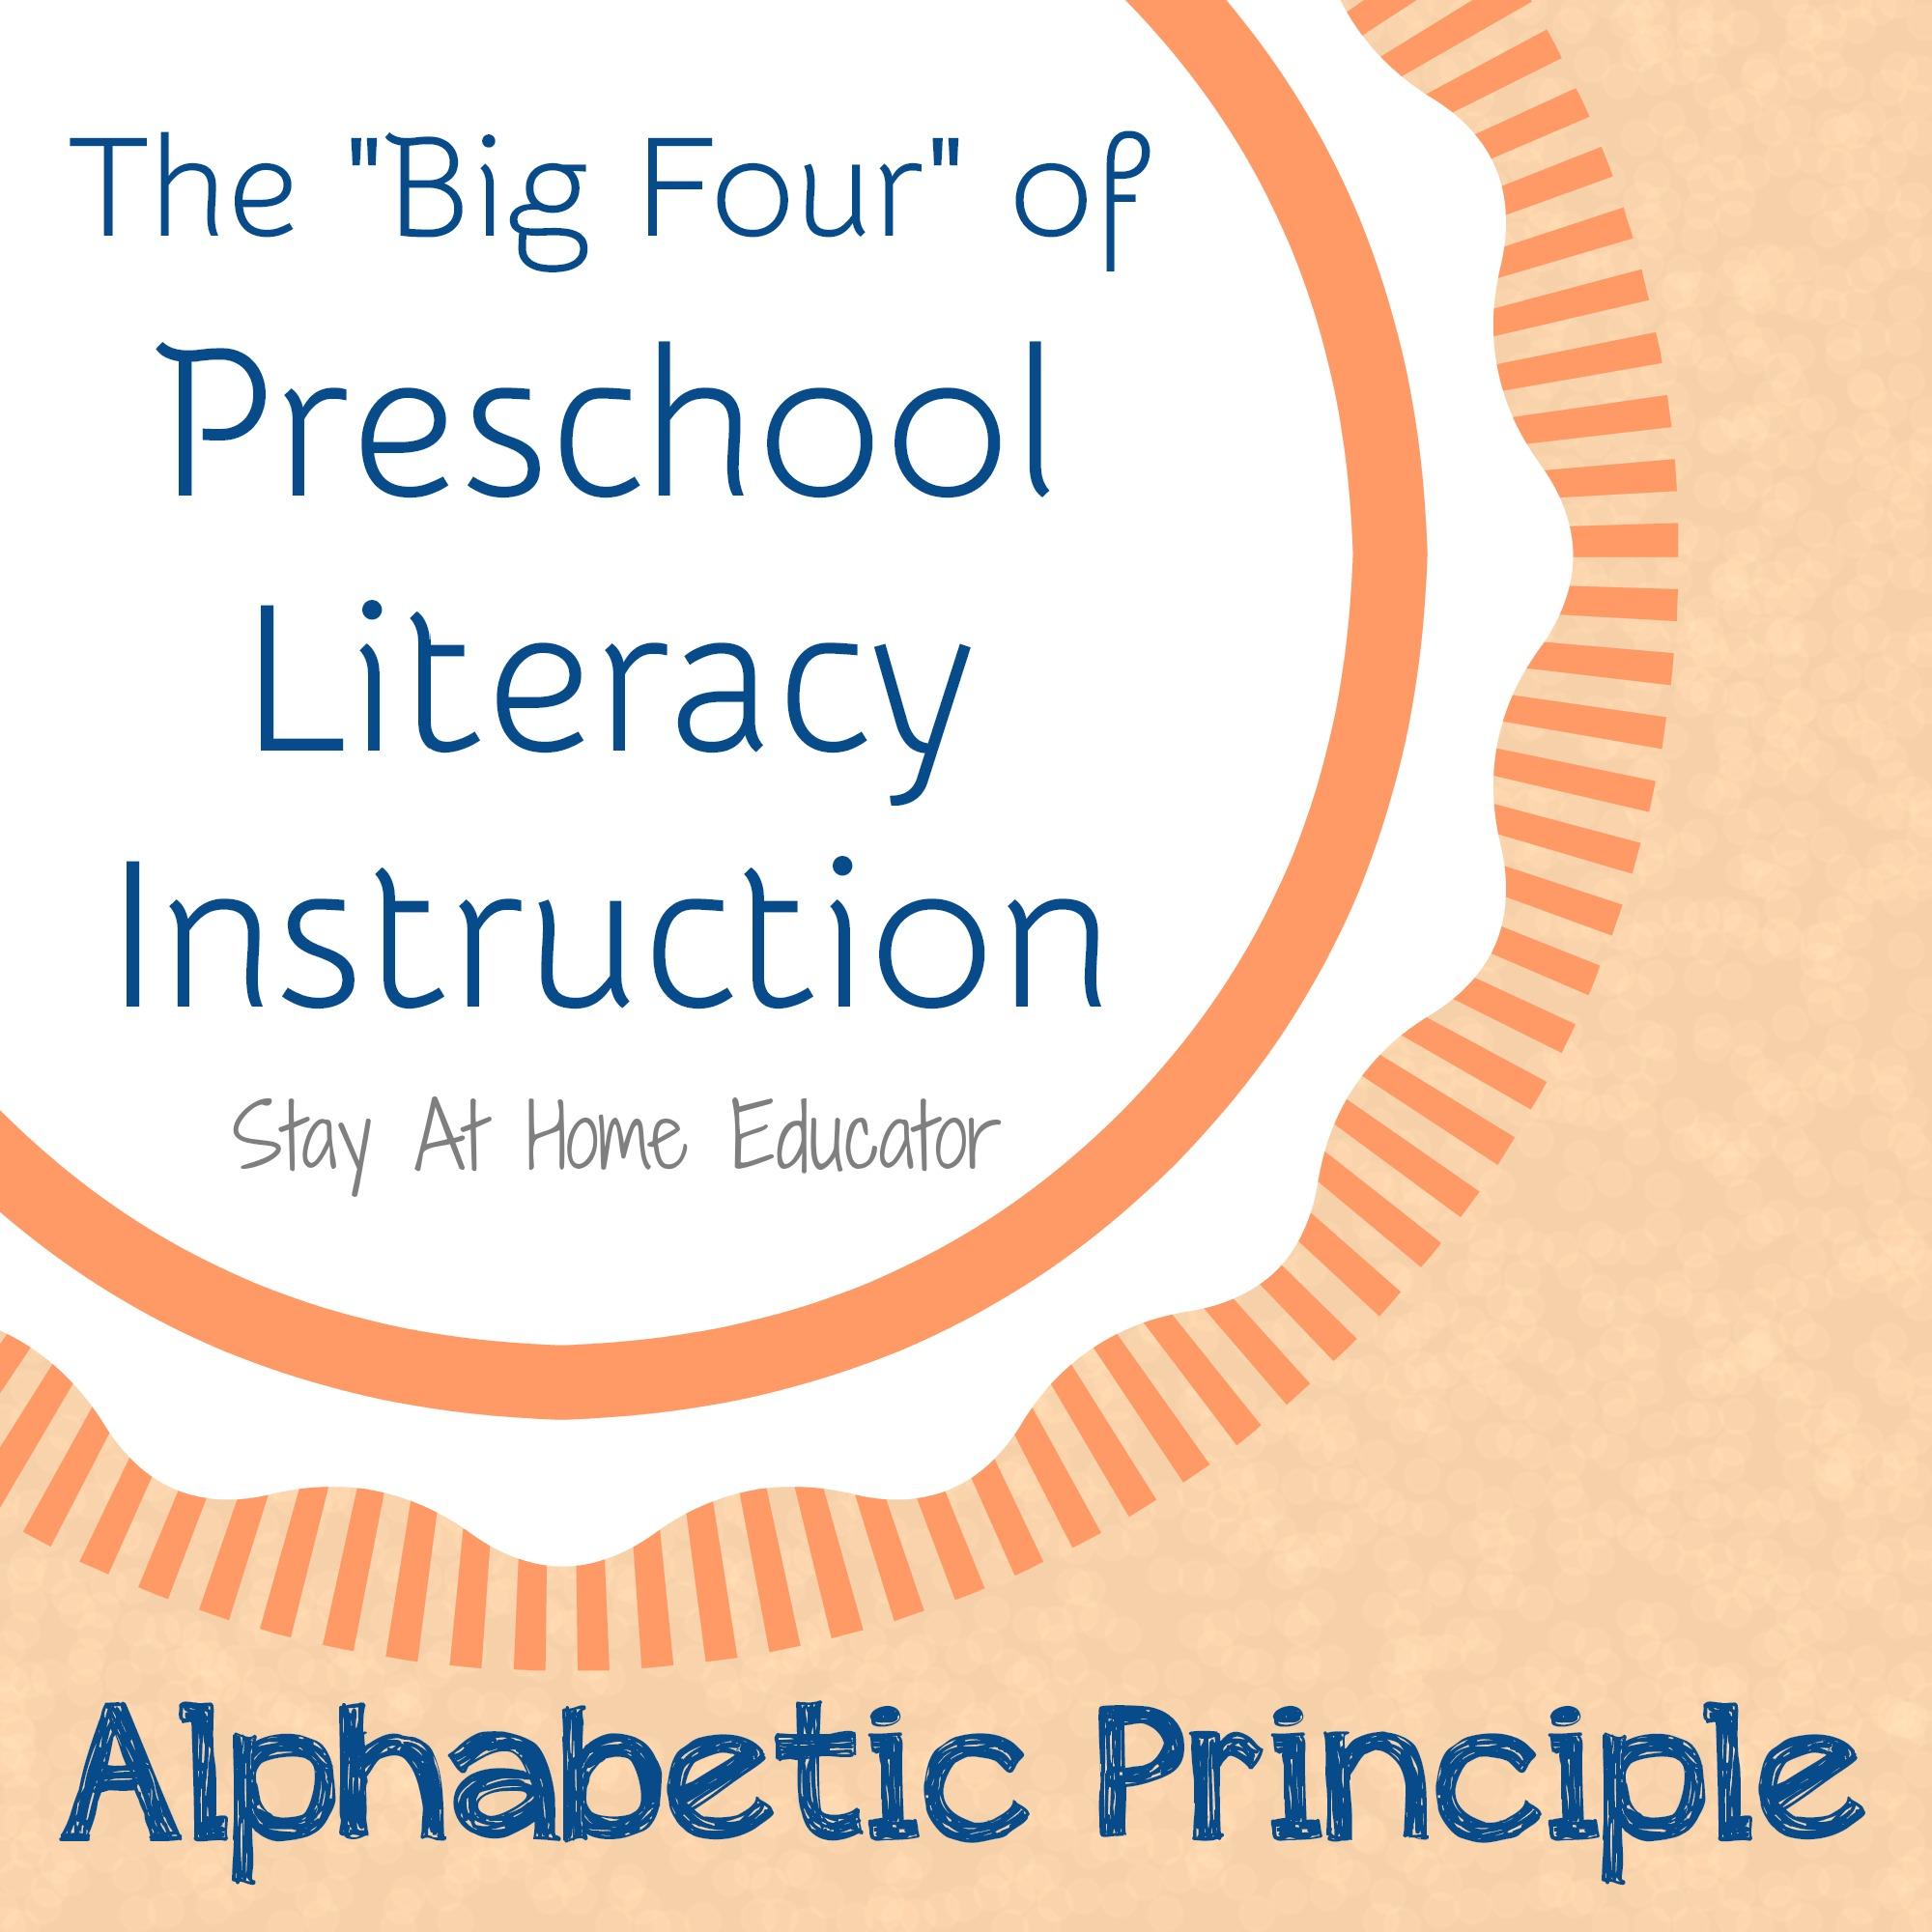 The Big Four Of Preschool Literacy Instruction